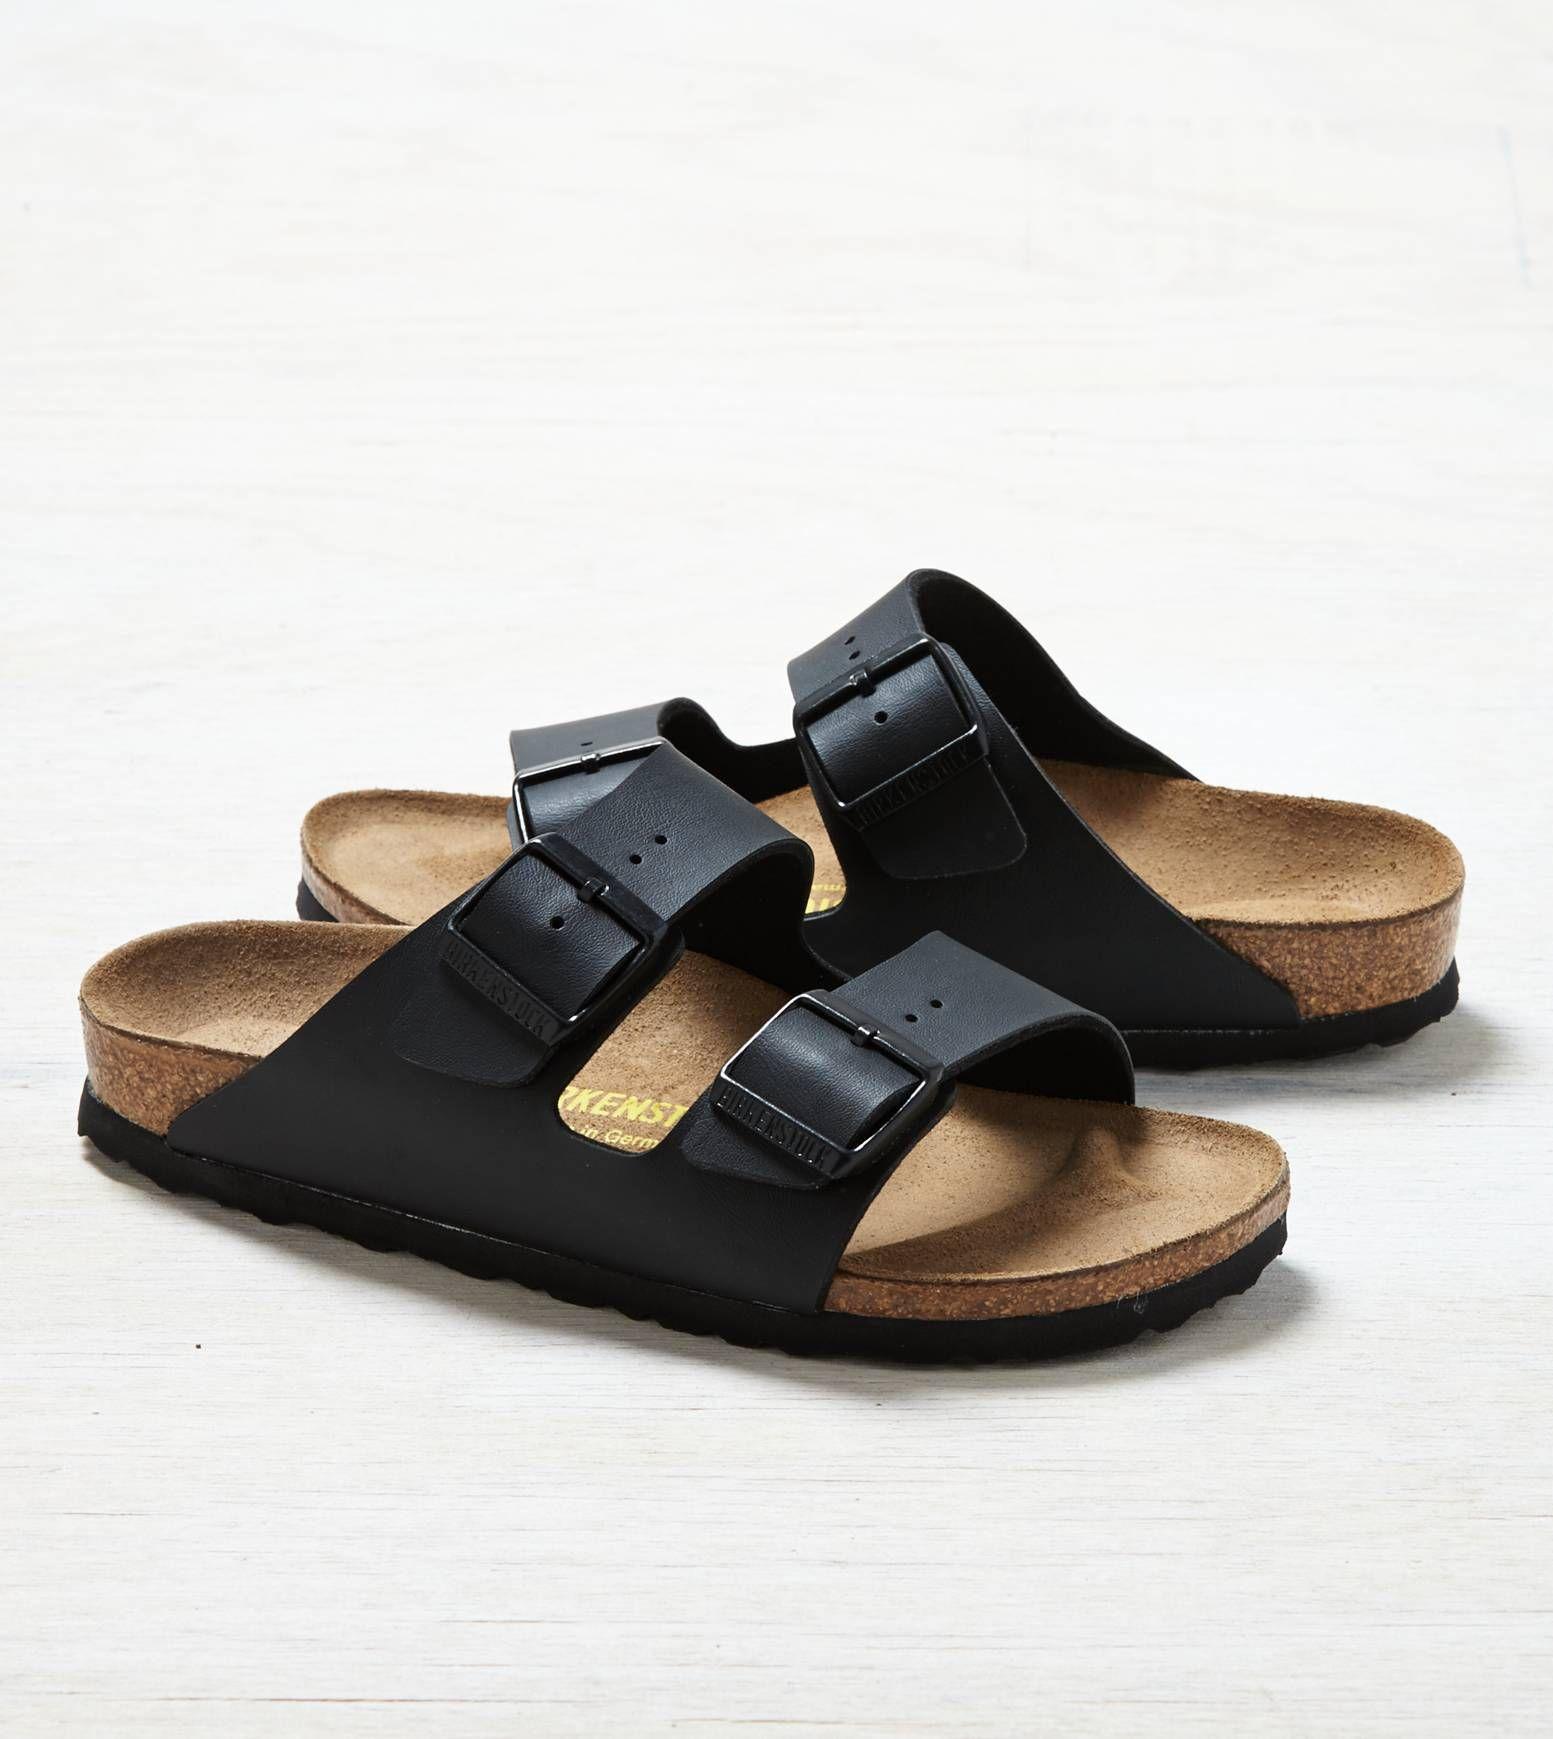 Zapatos azules formales Birkenstock Arizona para hombre Hrz3XbUibW